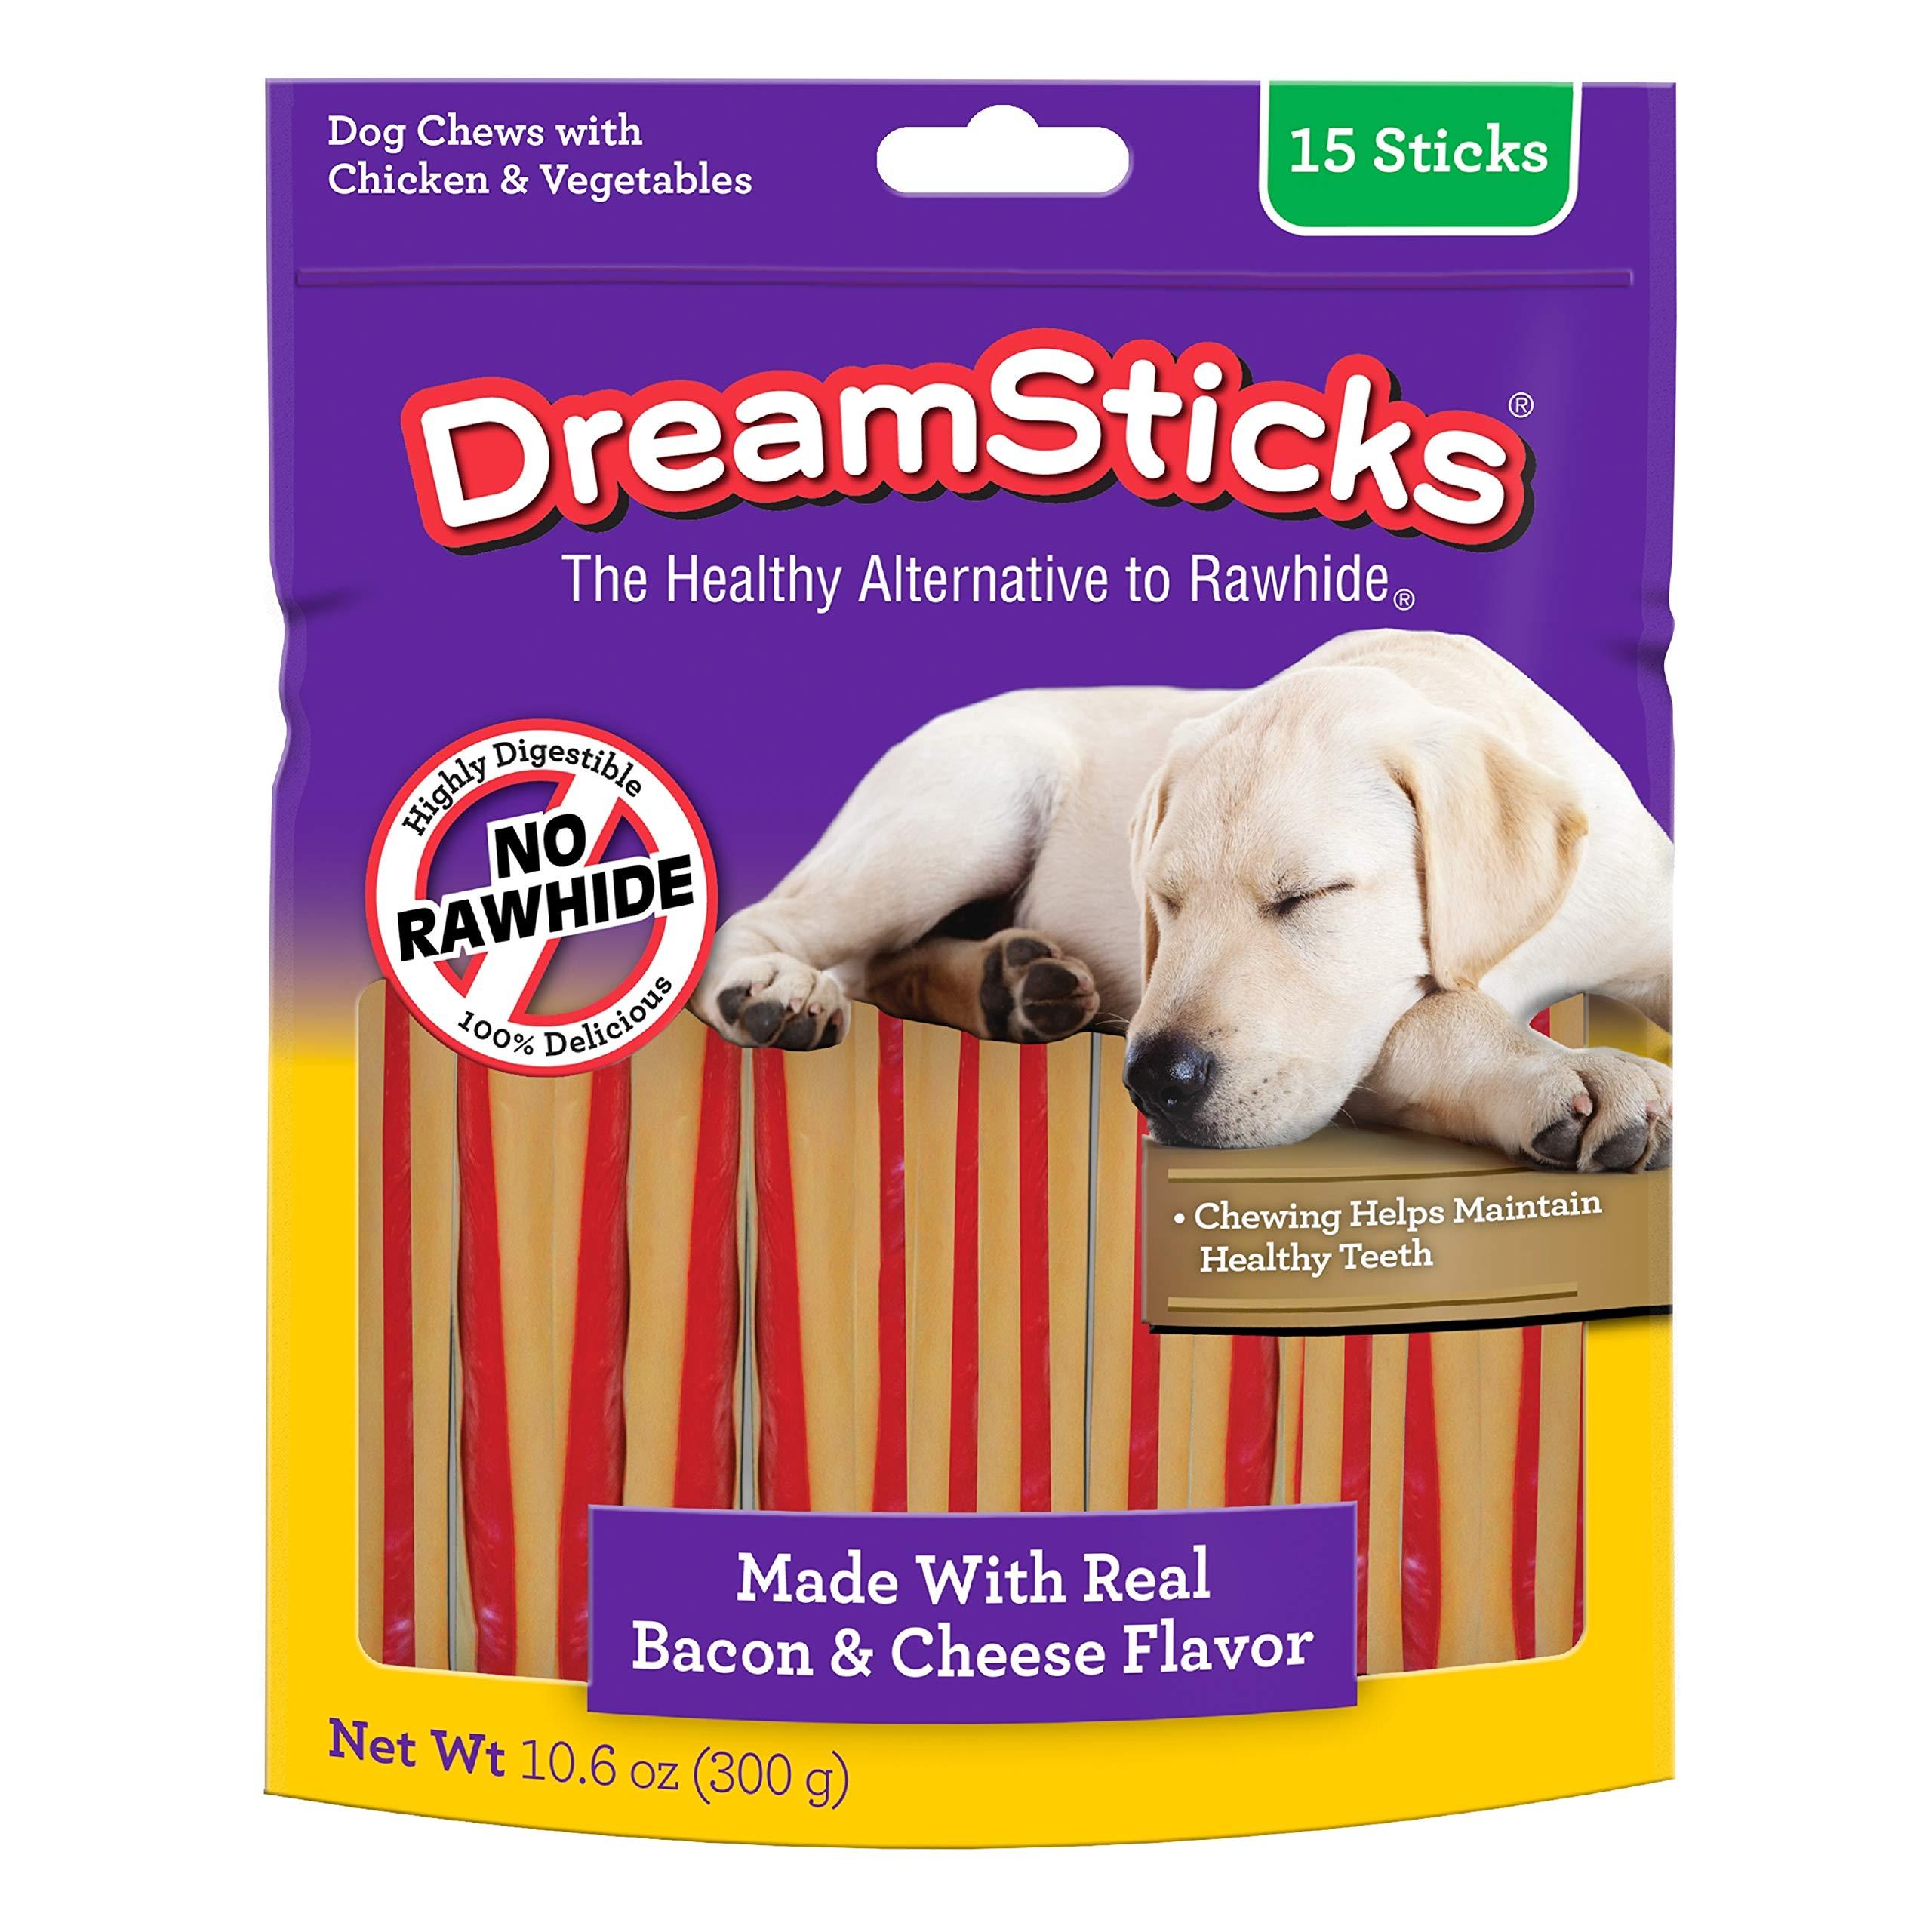 DreamBone DreamSticks Rawhide-Free chews for dogs